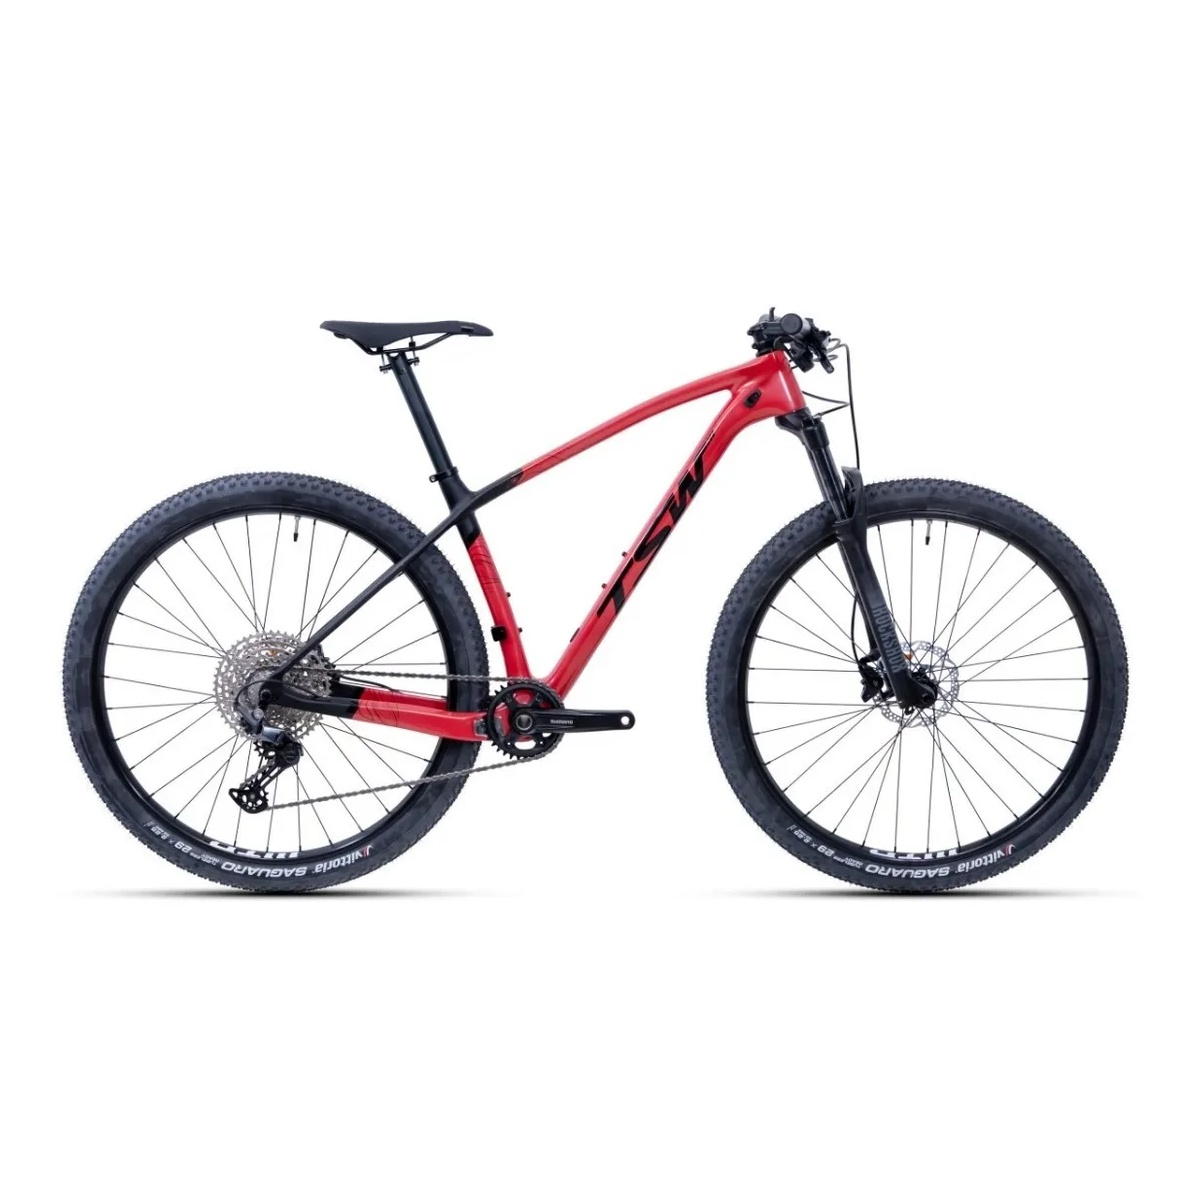 Bicicleta Tsw Evo Quest Starter Shimano Deore 12 Velocidades